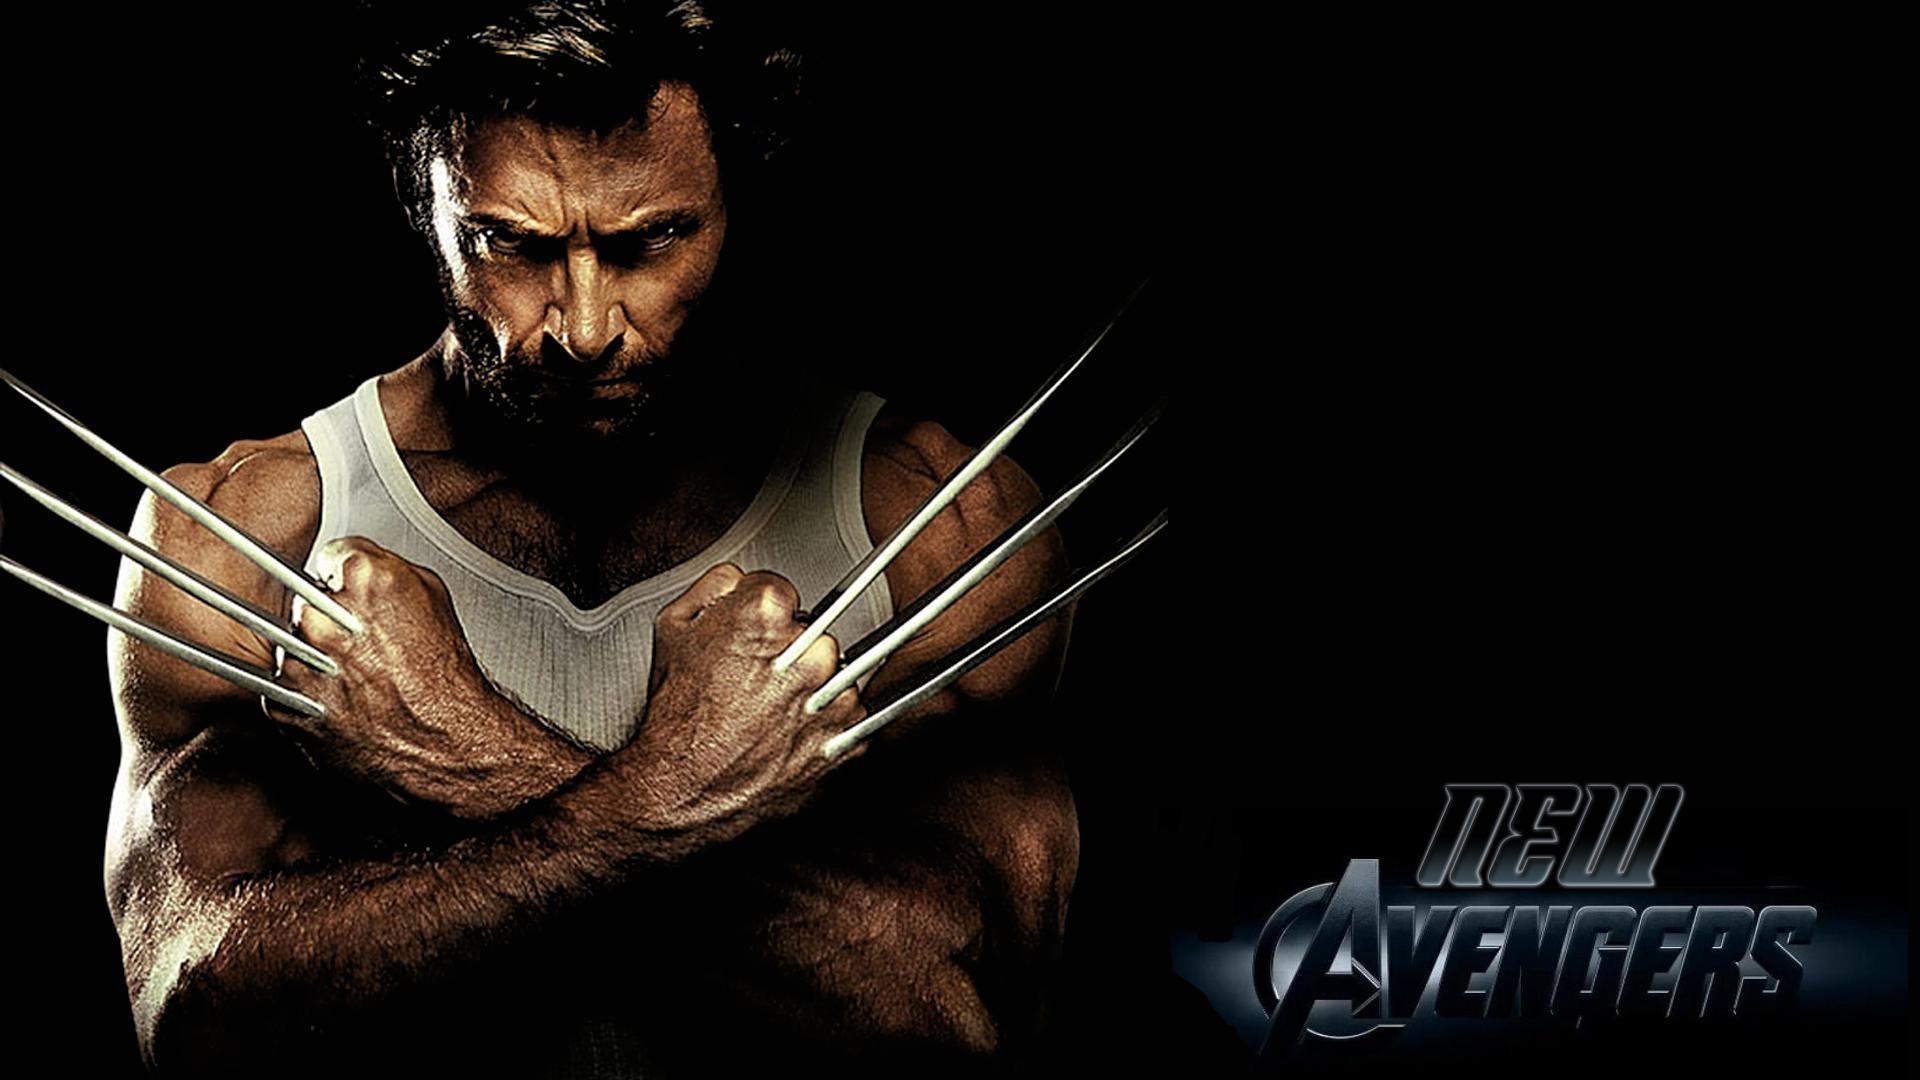 Wolverine Claws Wallpaper Background